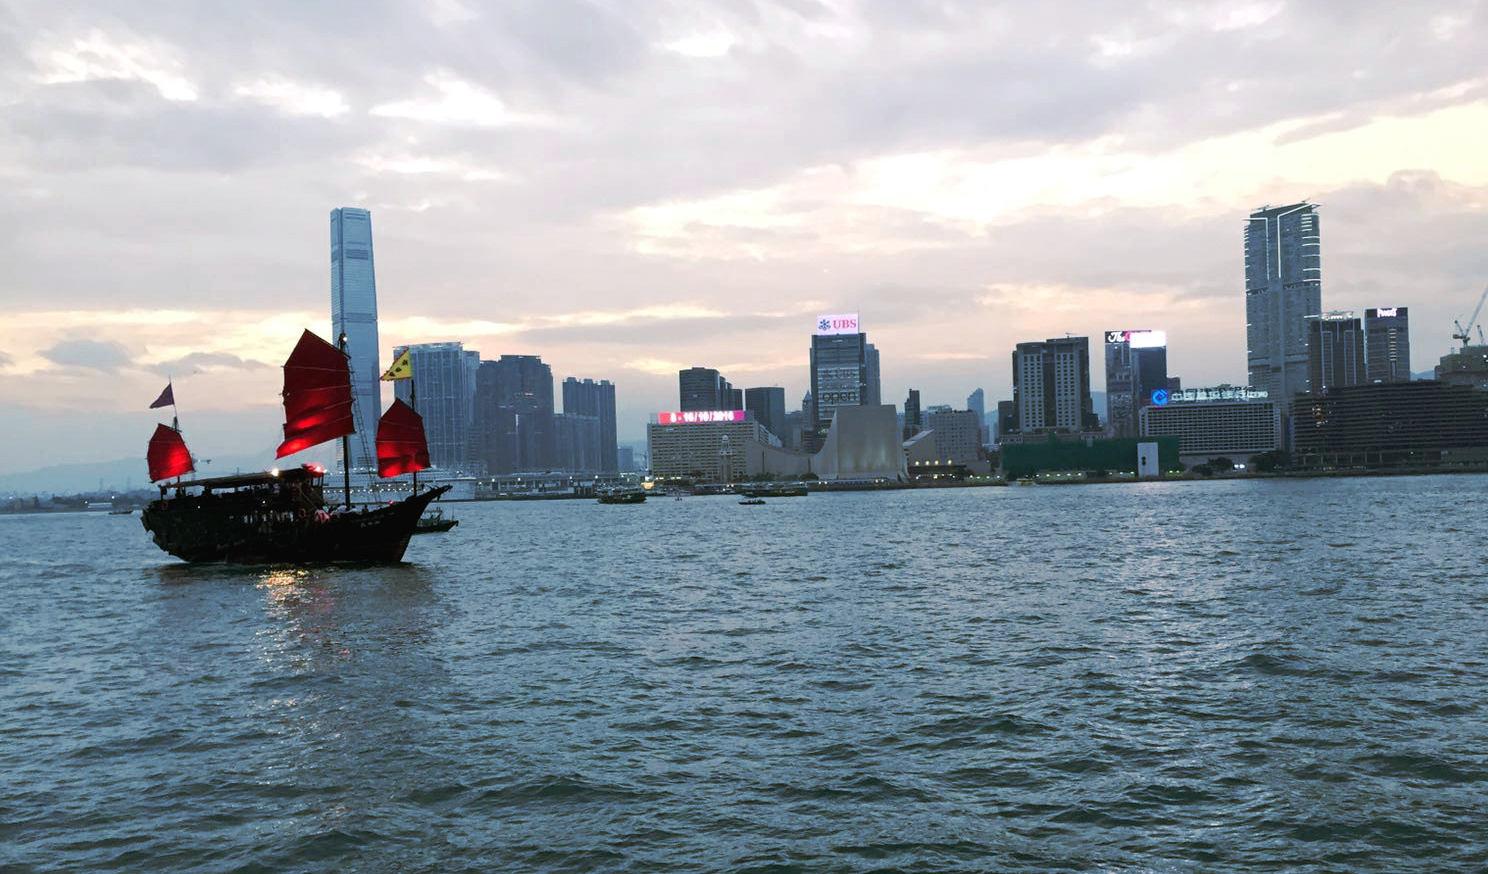 hongkong statek wiezowce iglawpodrozy